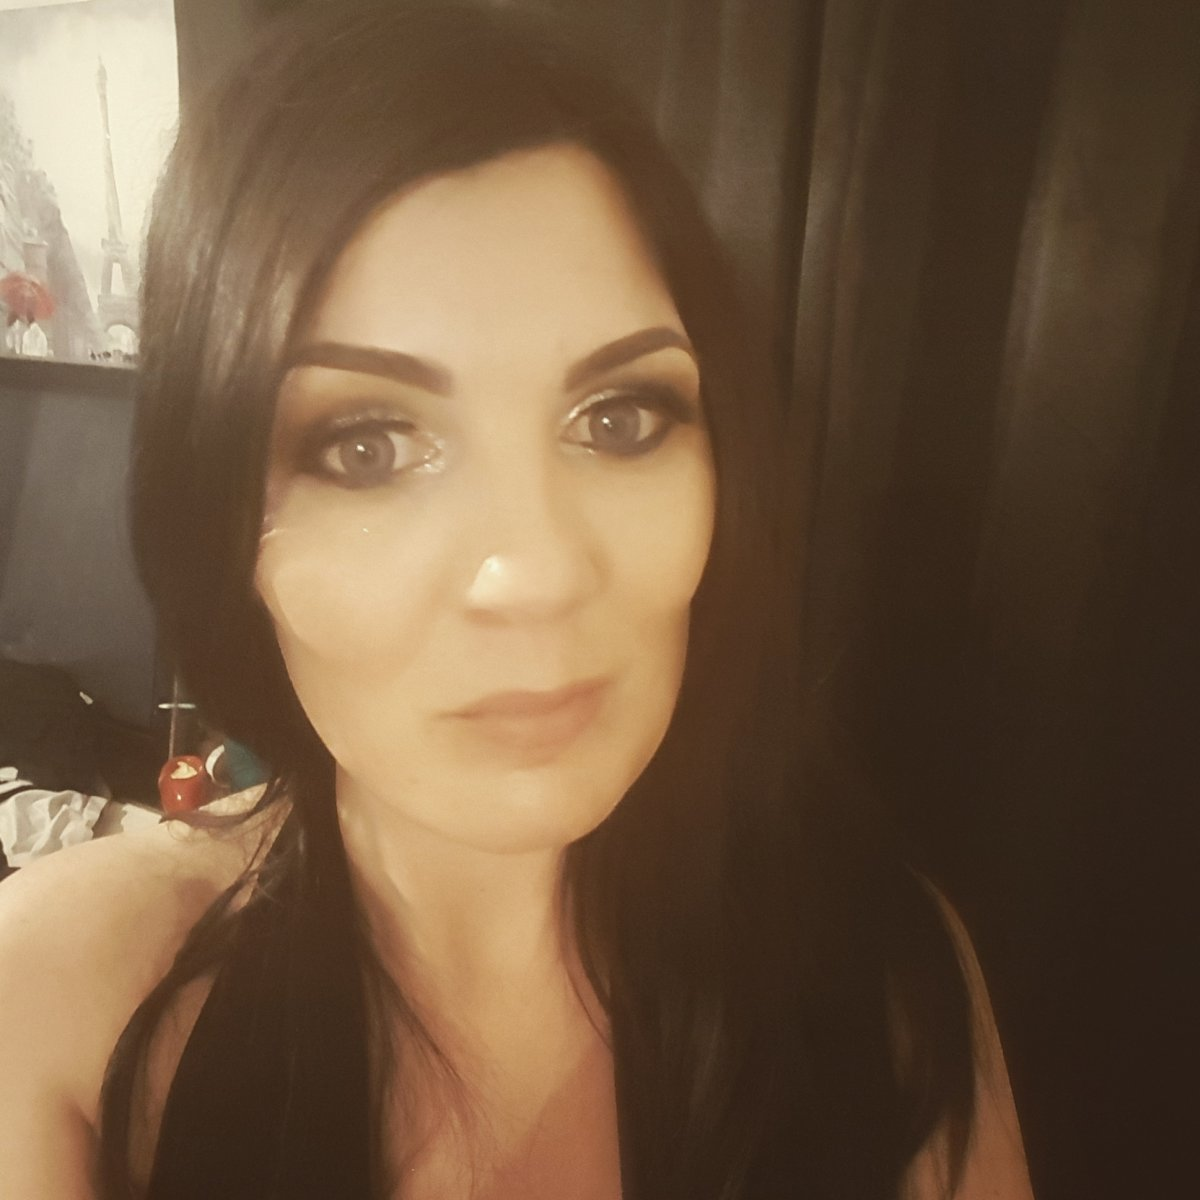 Toni dickson's profile pic